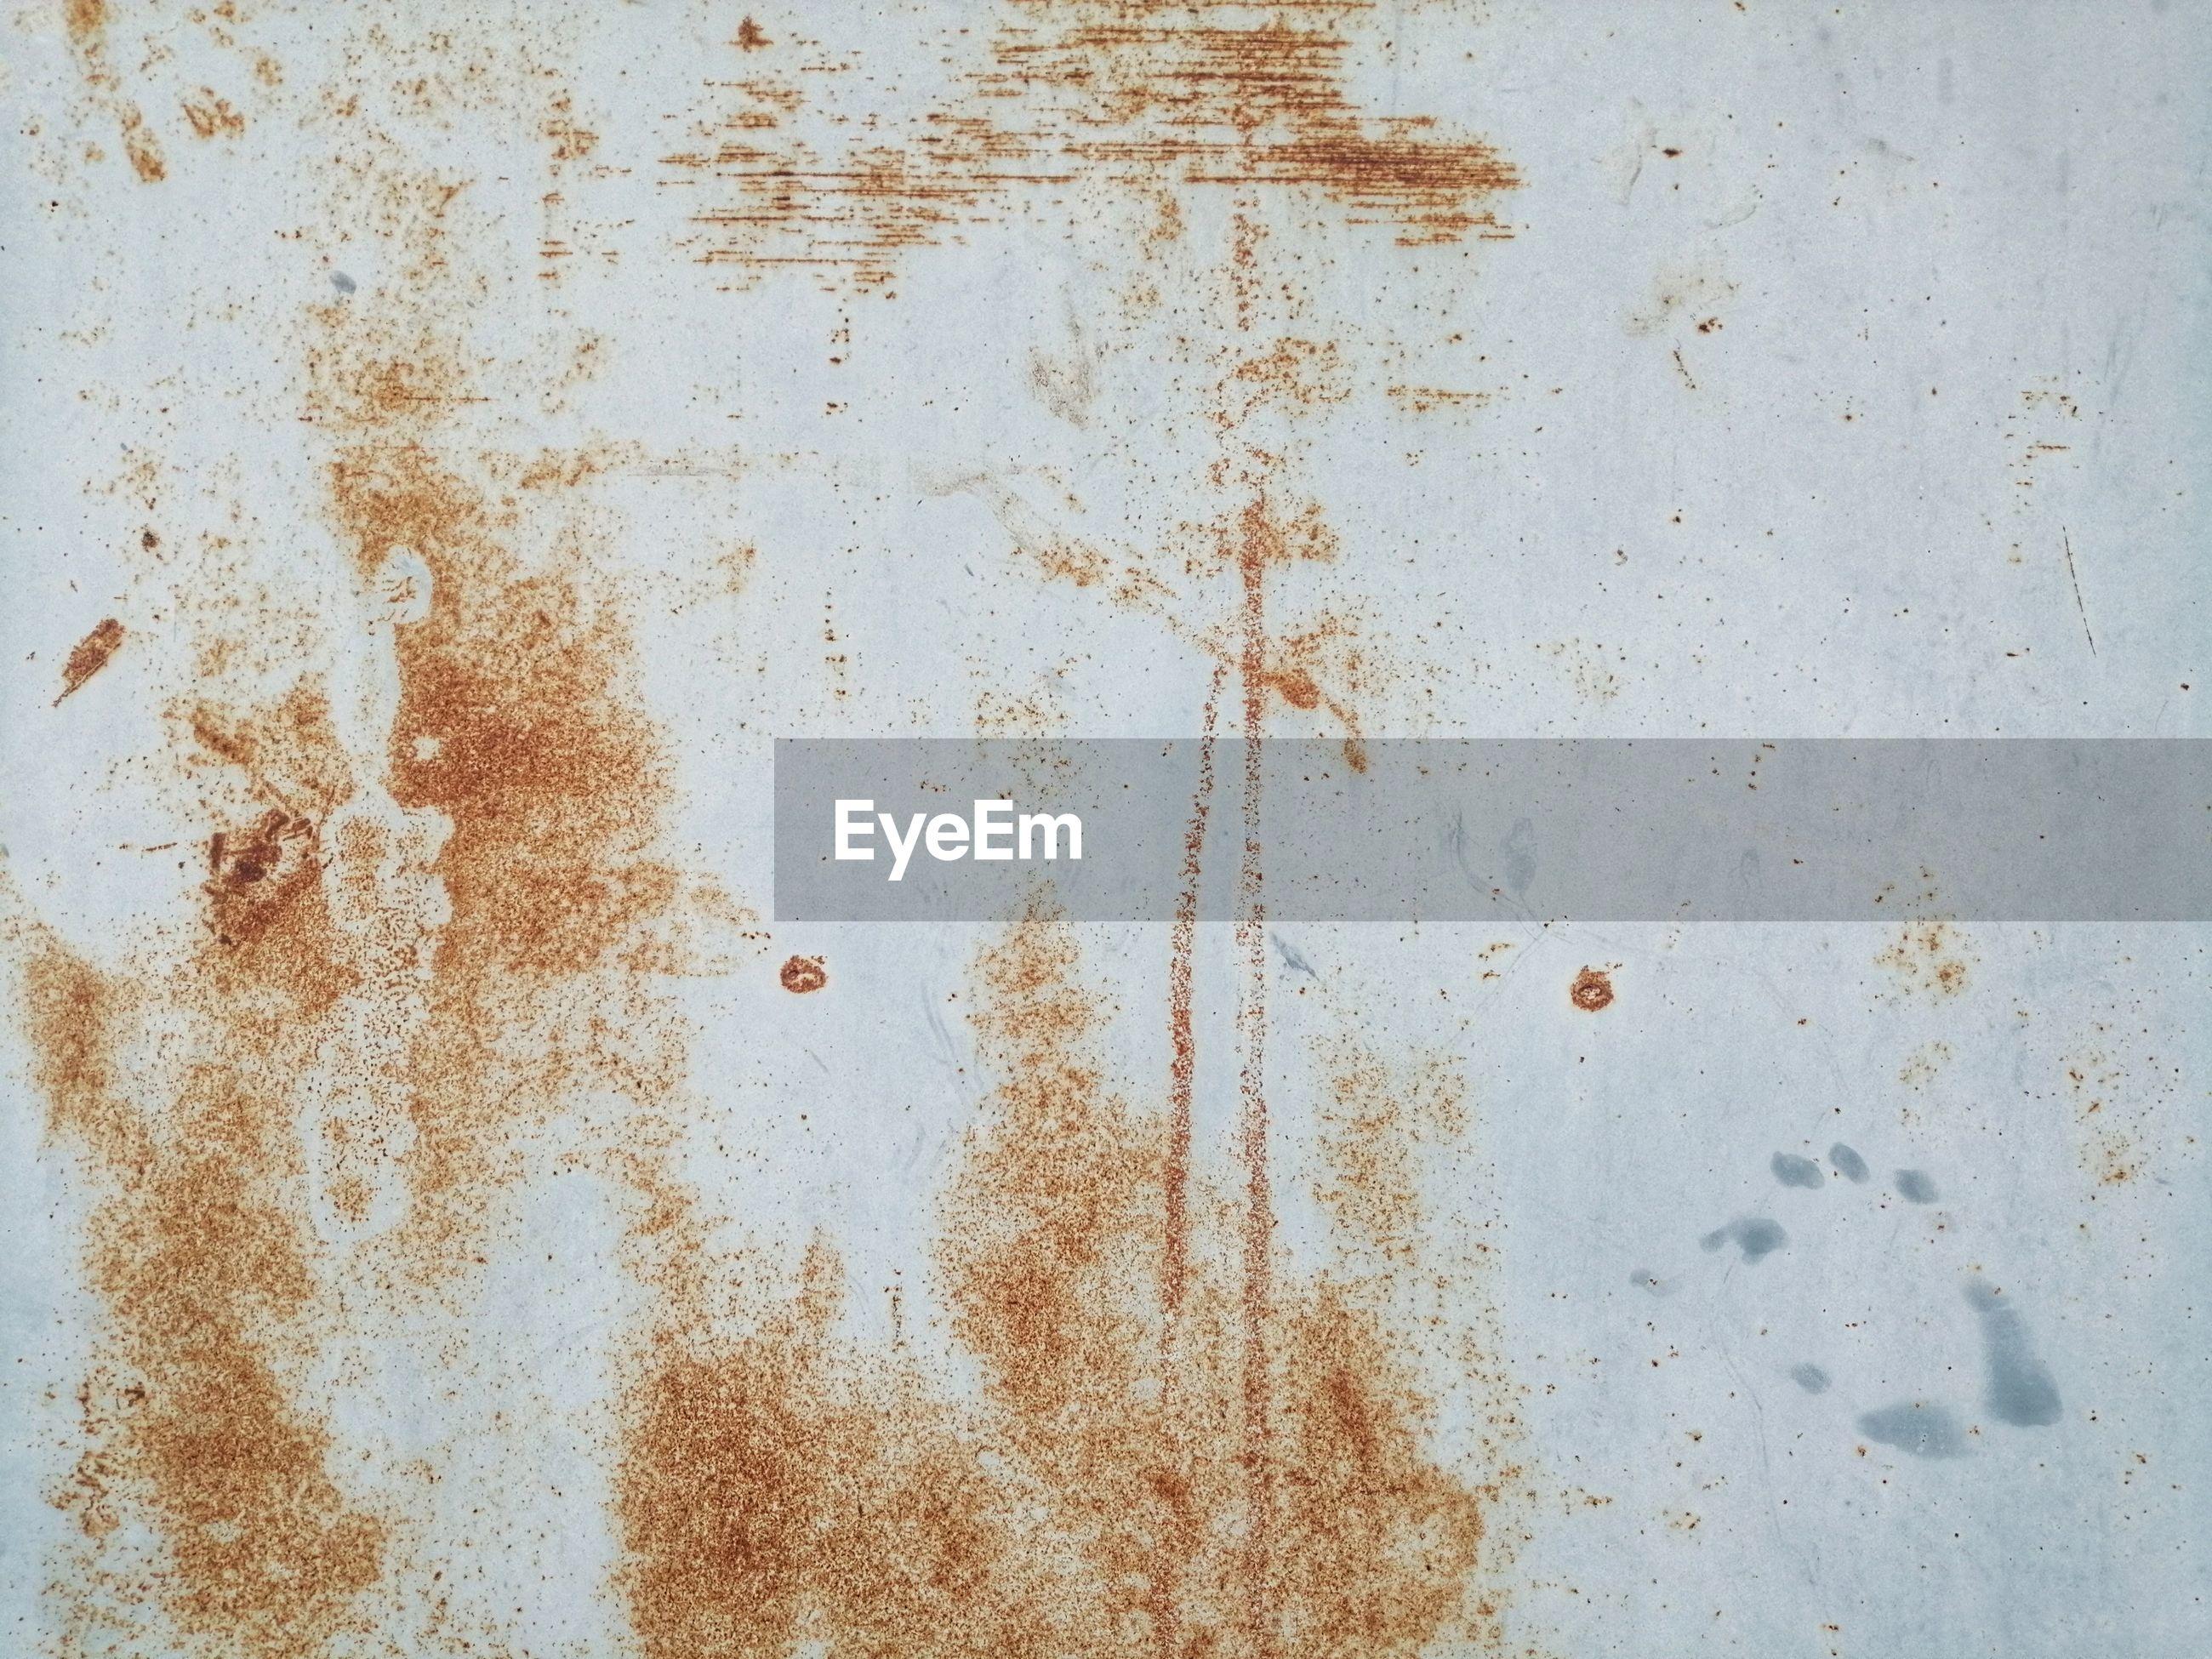 Rusty on metal sheet